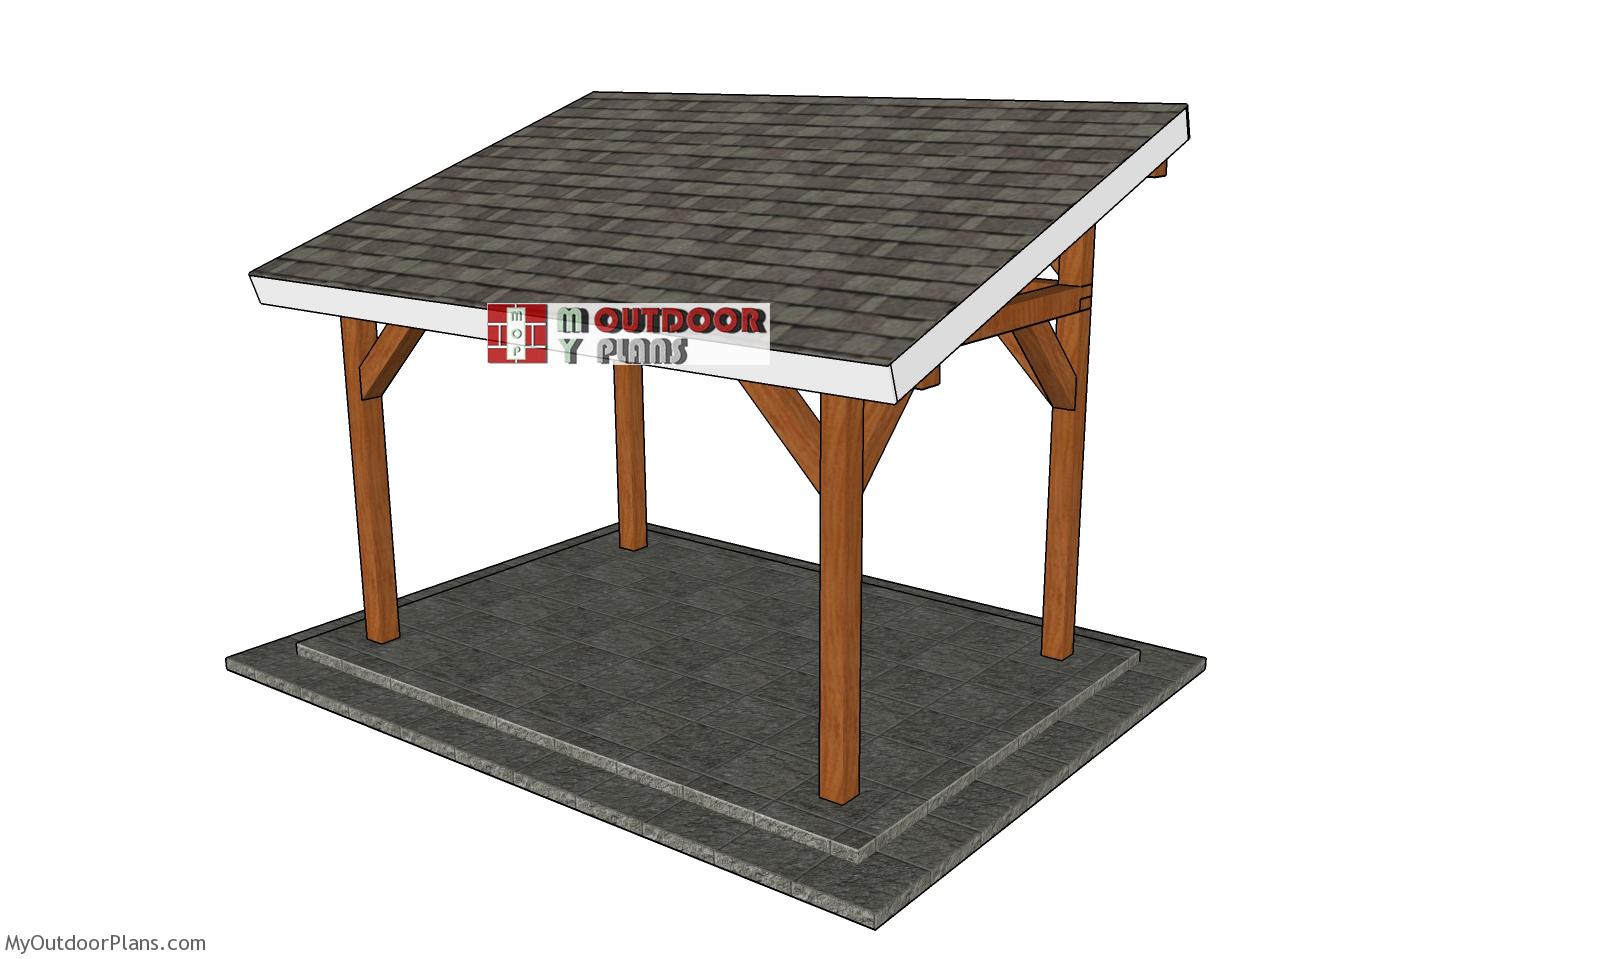 8x12 Lean to Pavilion - Free DIY Plans